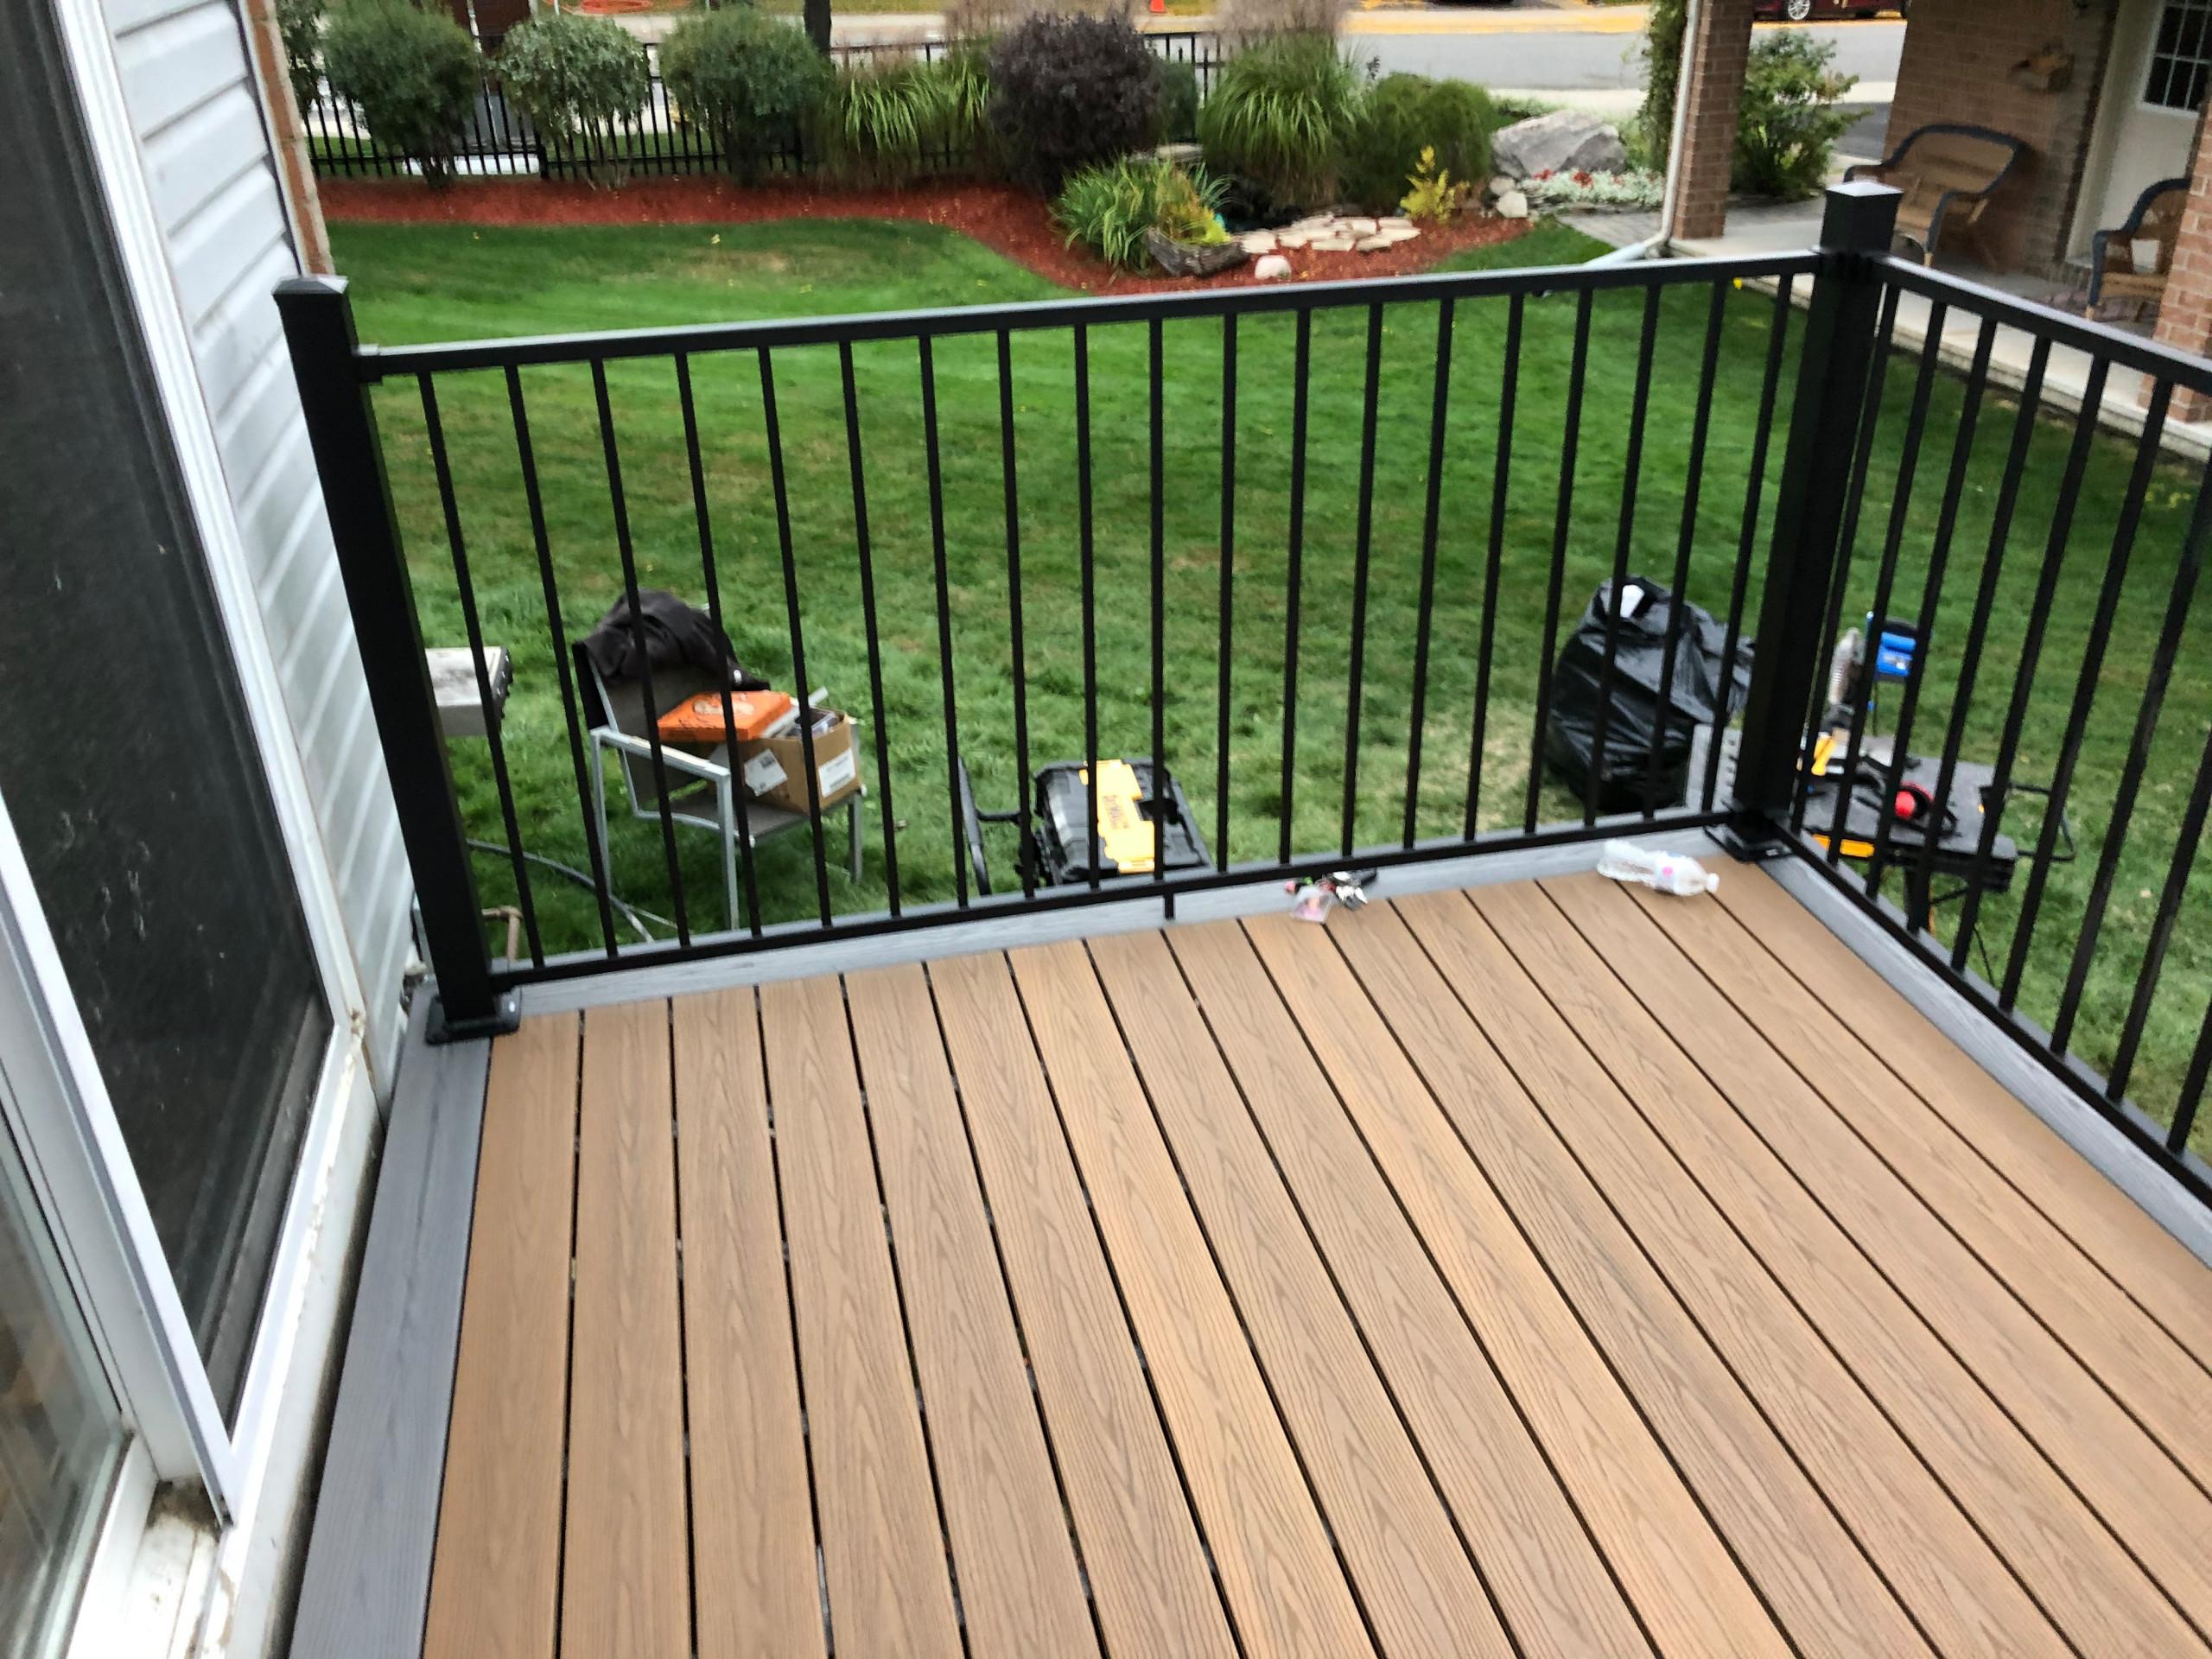 composite deck with black railing